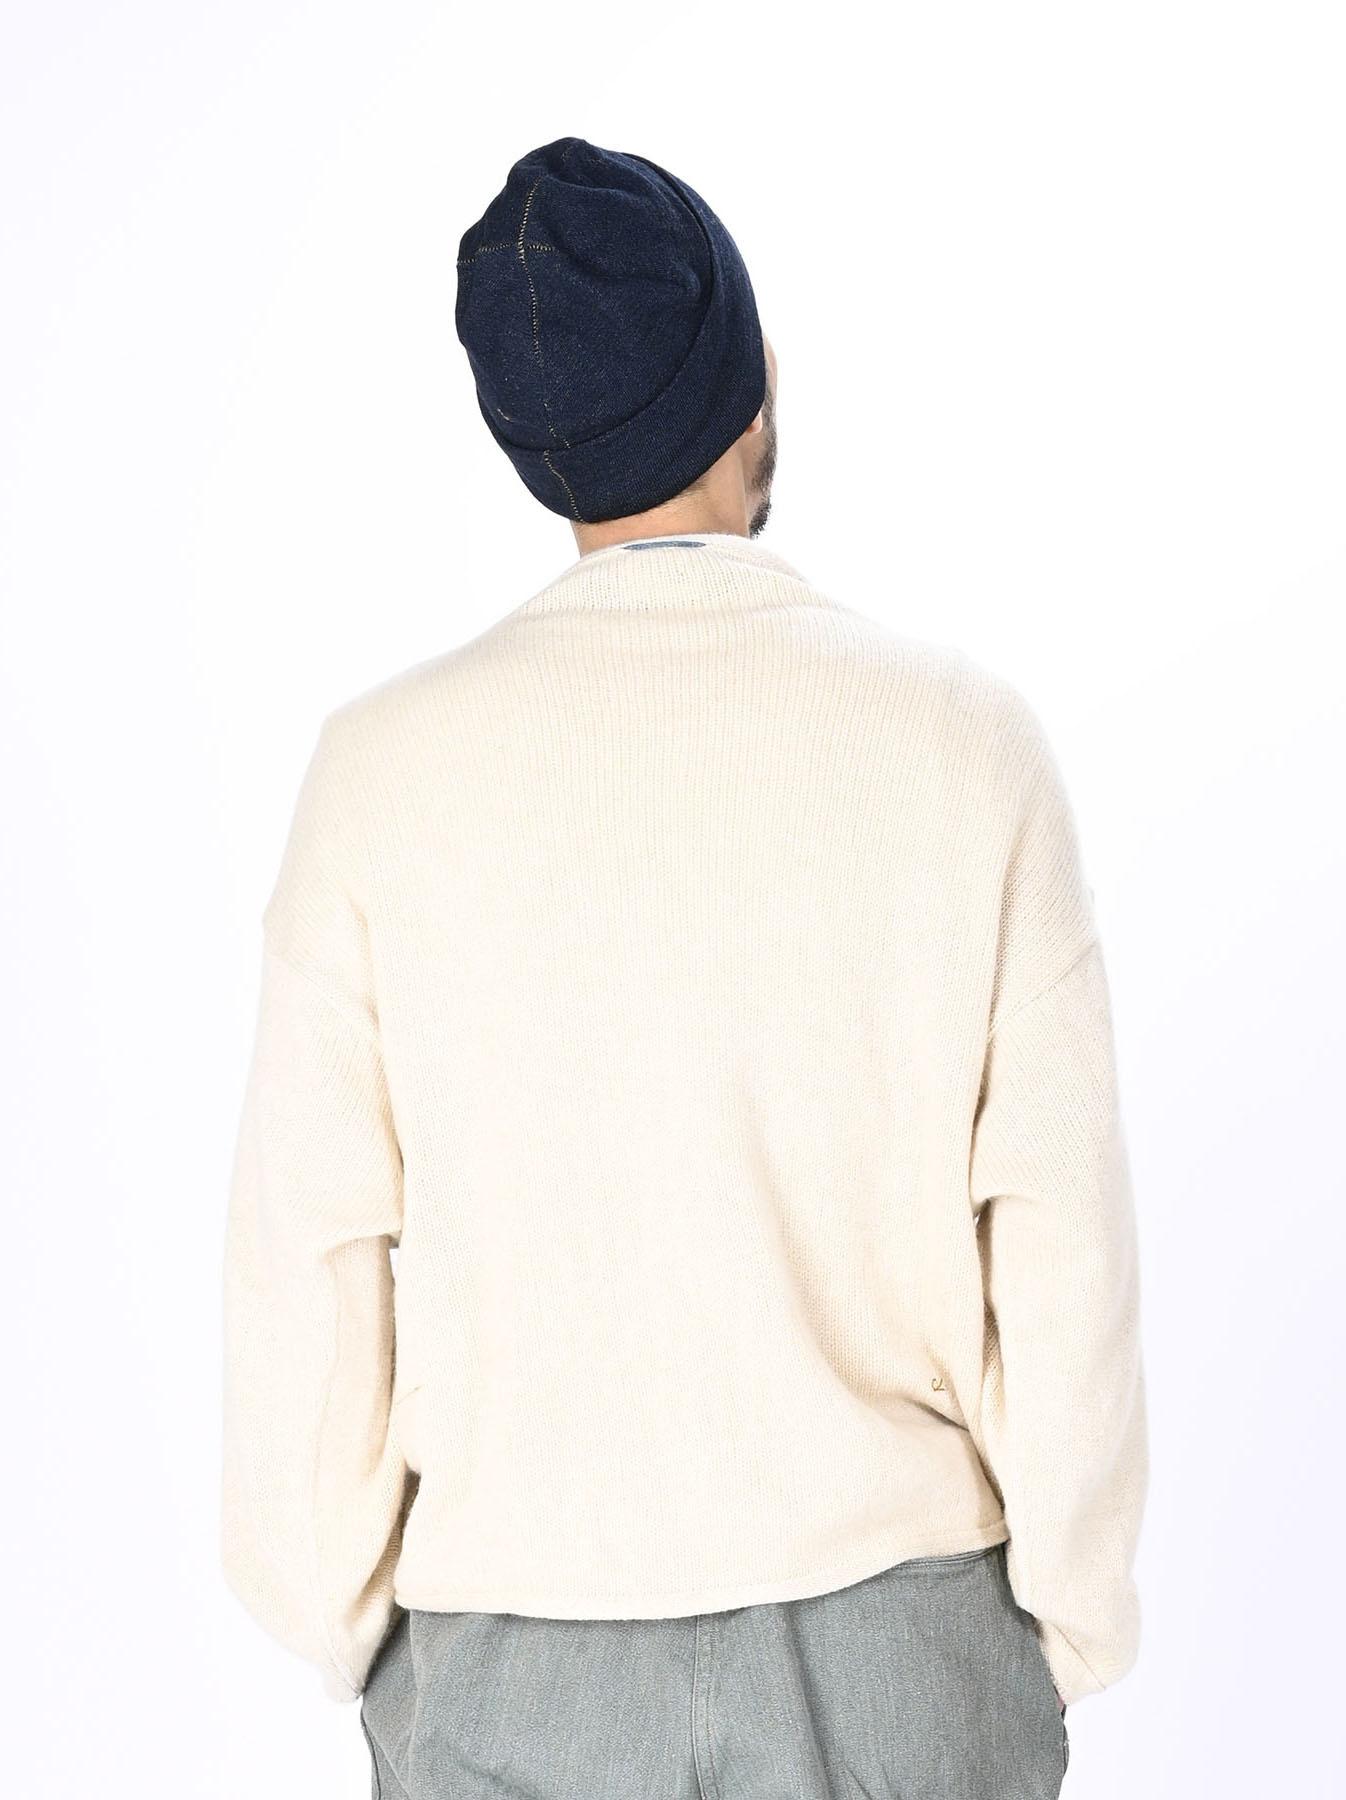 45 Star Cashmere Umahiko Sweater-5